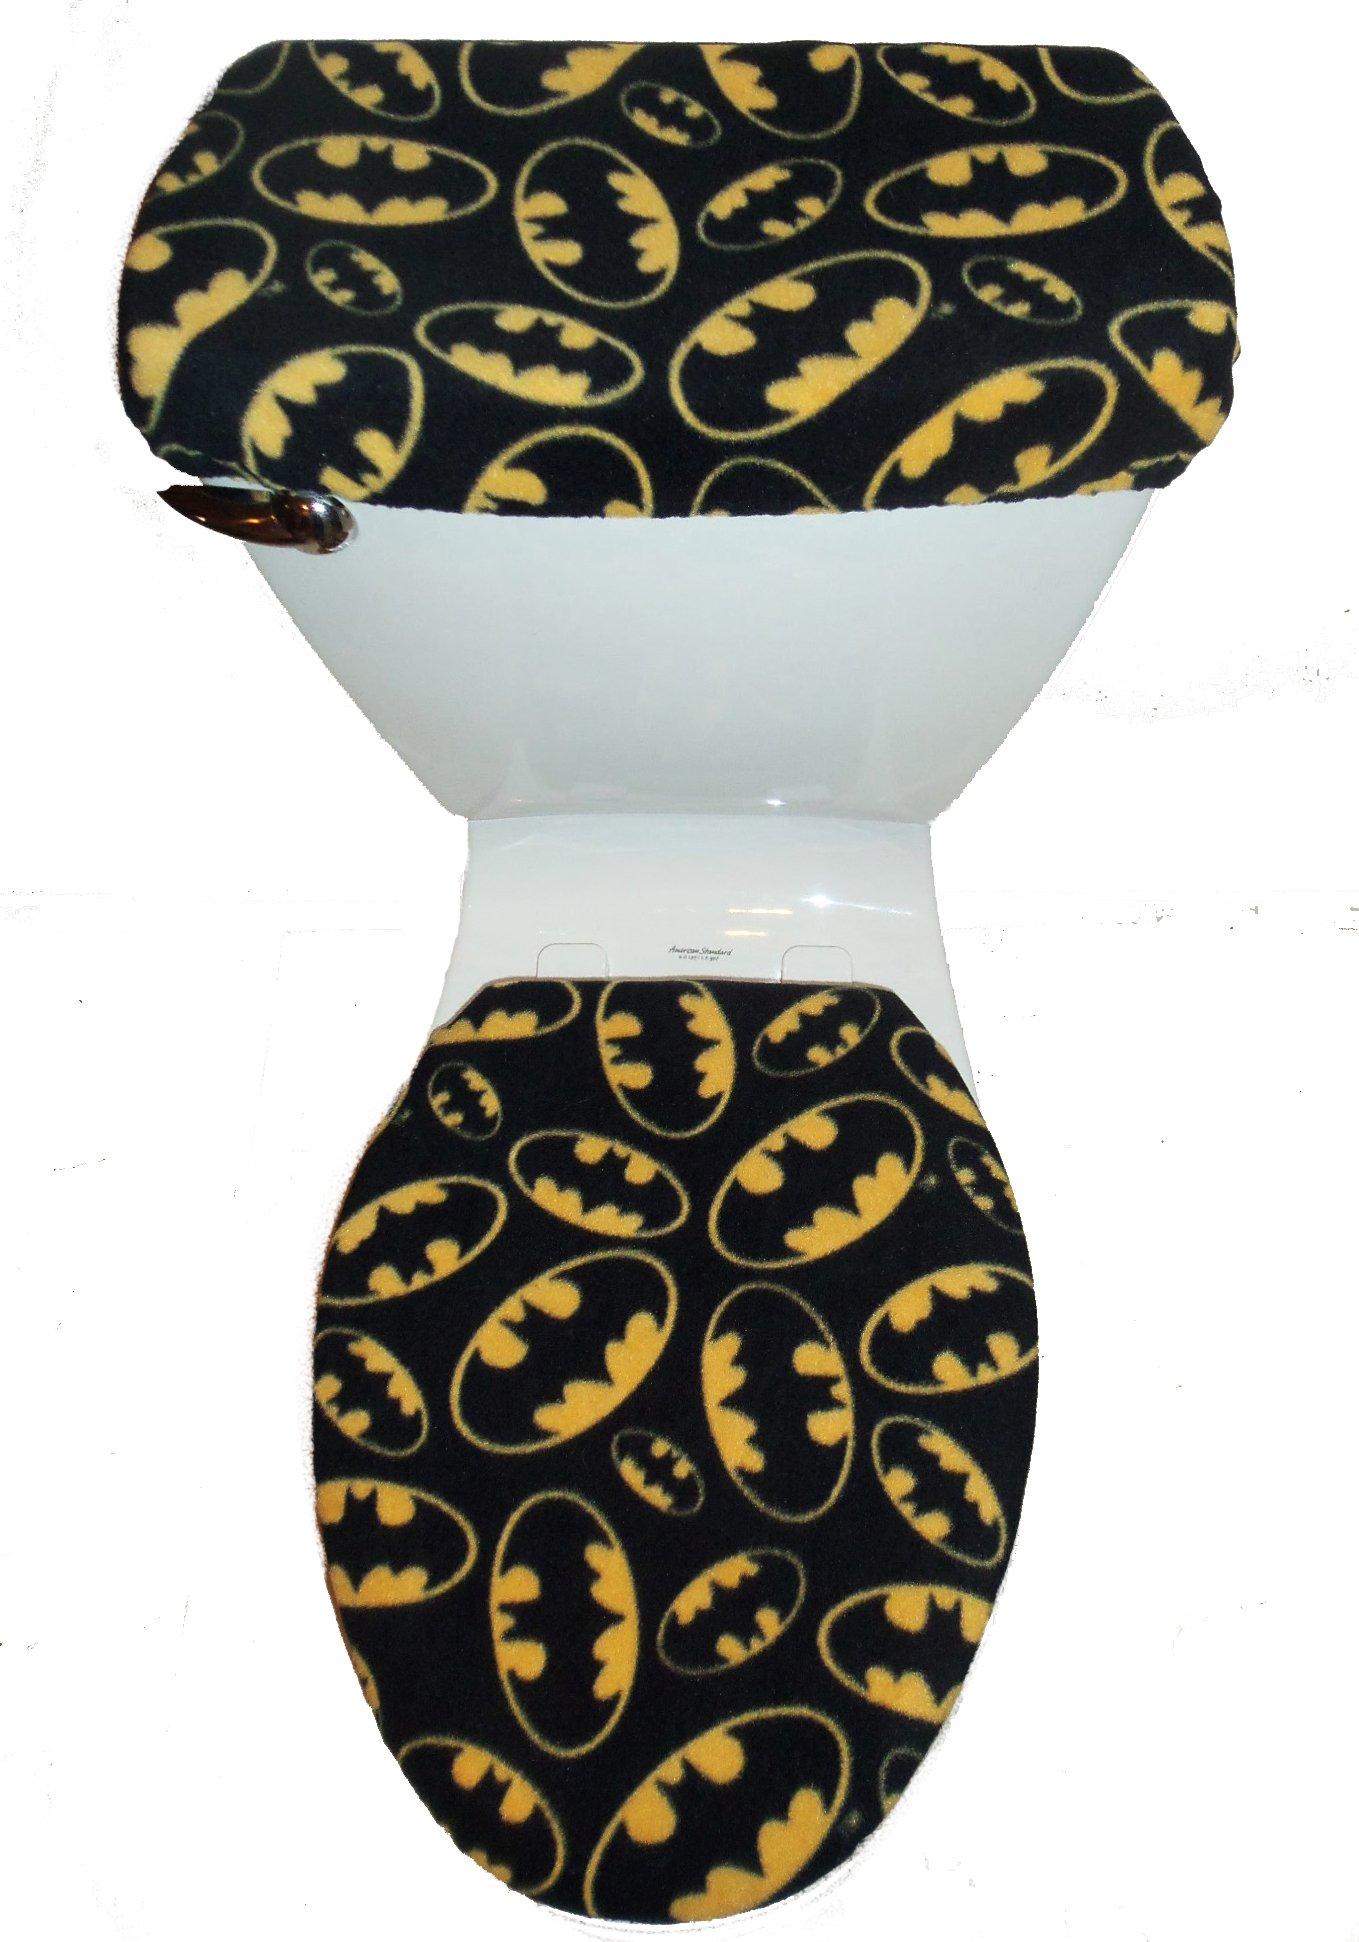 Rock'N Deals Seller Batman Logo Fleece Toilet Seat Cover Set by Rock'N Deals Seller